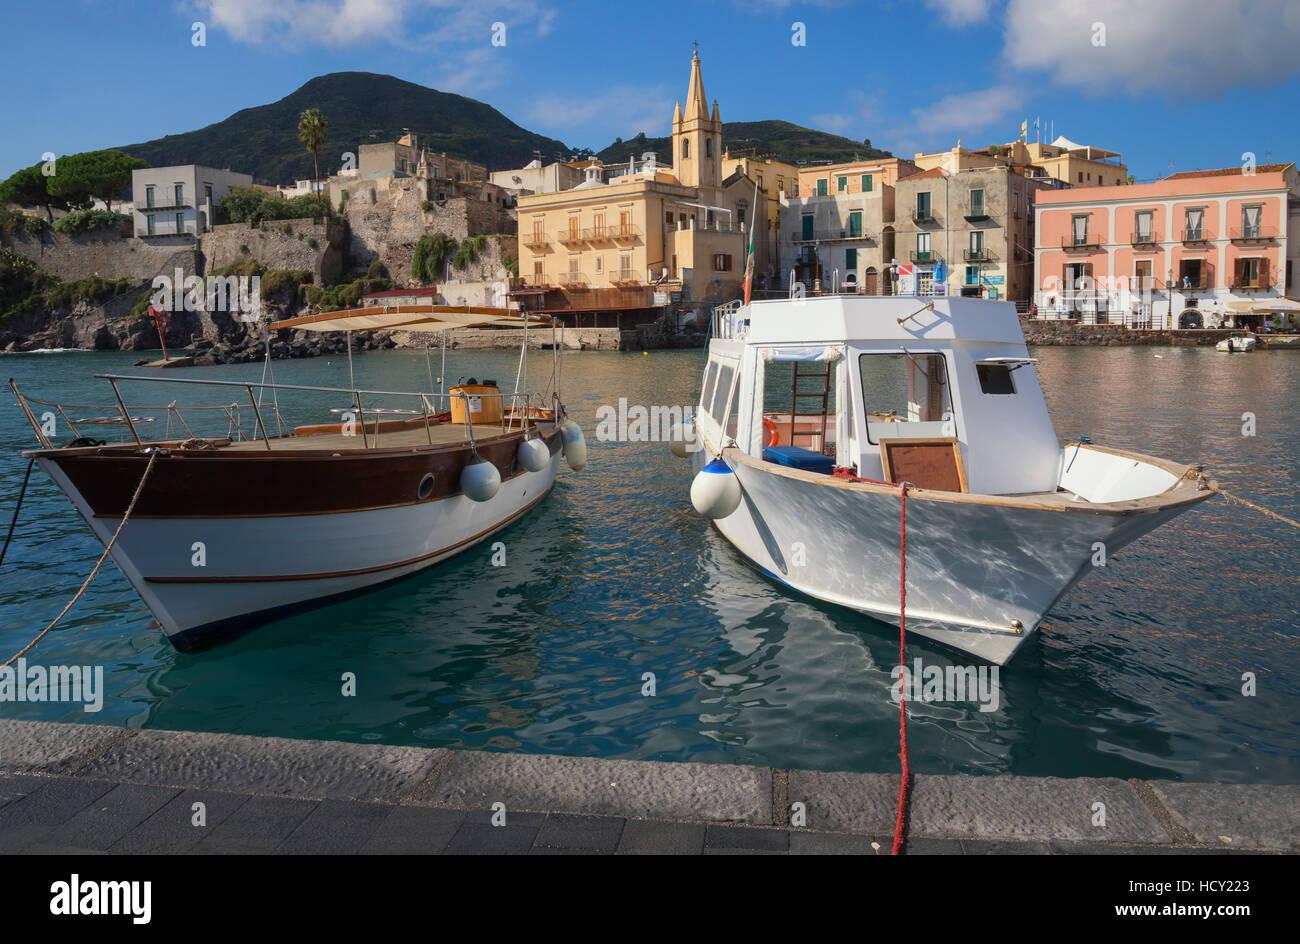 Marina Corta Harbour e San Giuseppe chiesa, Isola di Lipari, Isole Eolie, UNESCO, Sicilia, Italia, Mediterranea Immagini Stock